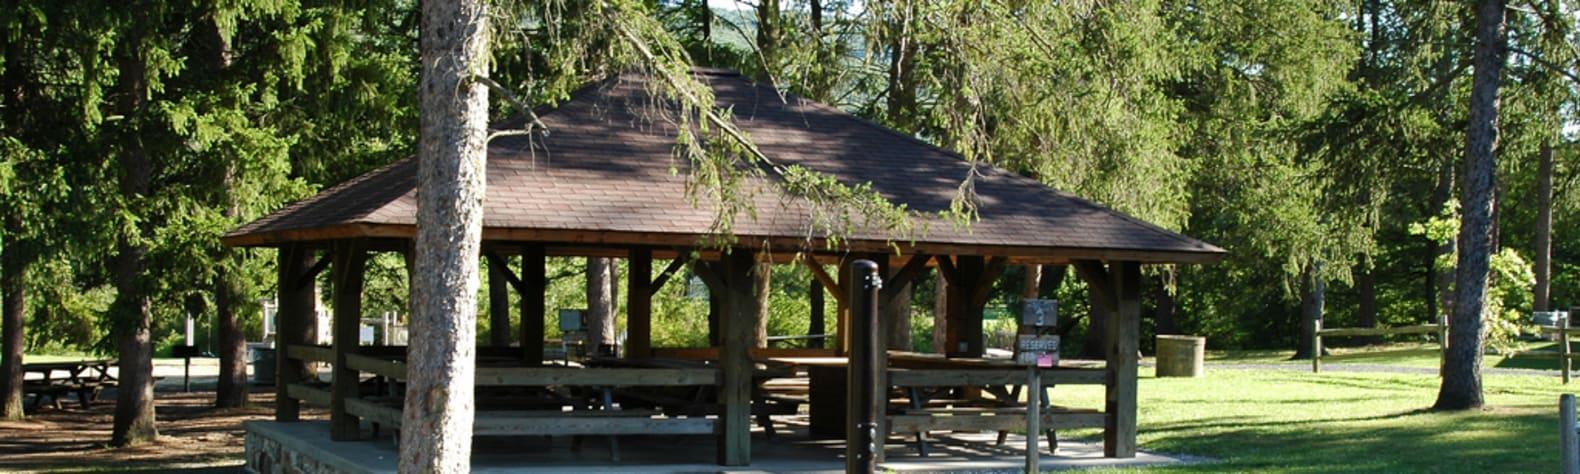 Greenwood Furnace State Park